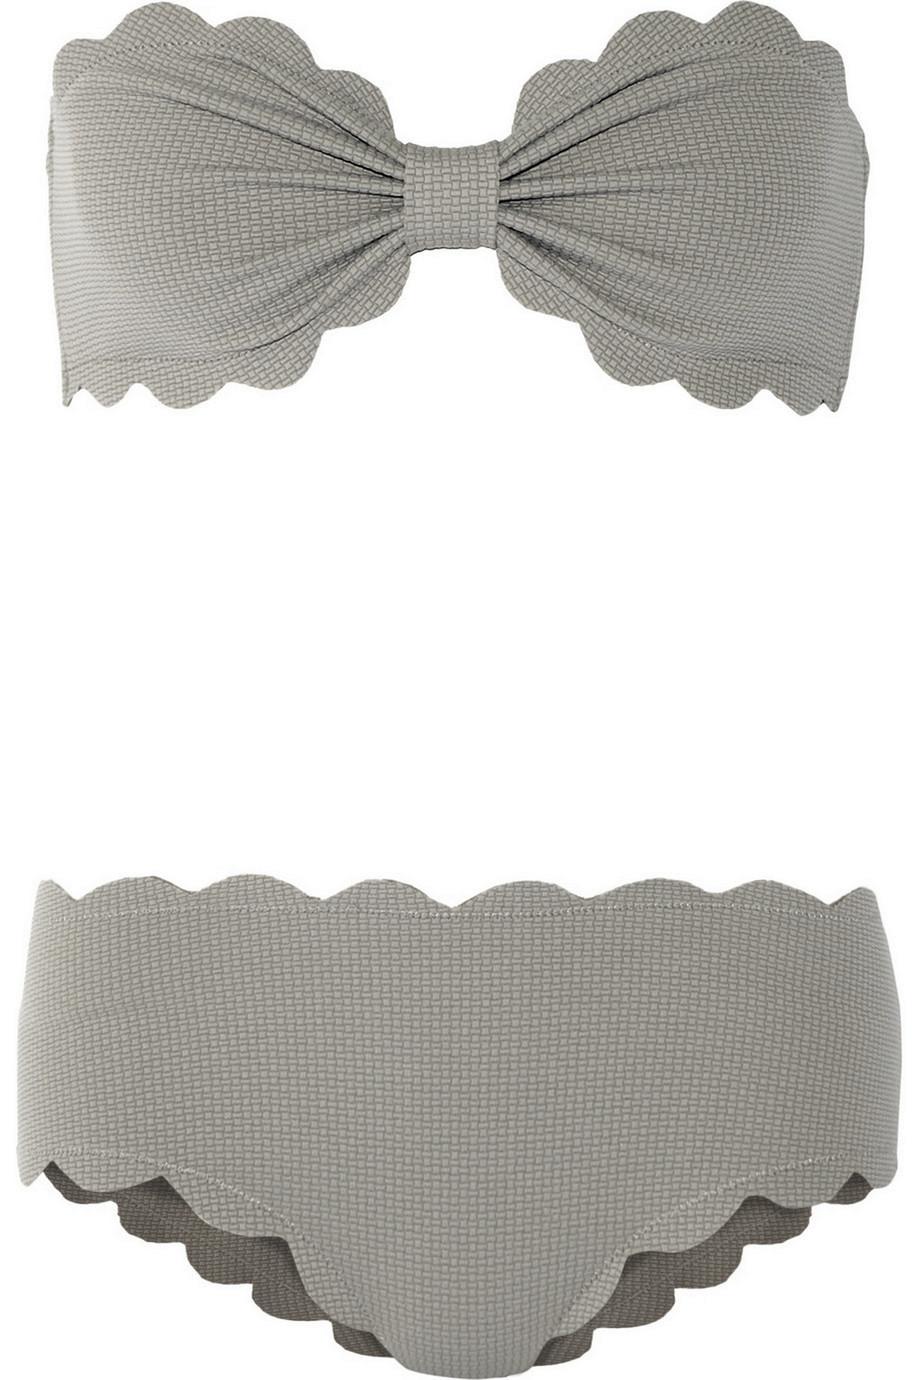 Marysia Antibes and Spring Scalloped Bandeau Bikini, Gray, Women's, Size: XS